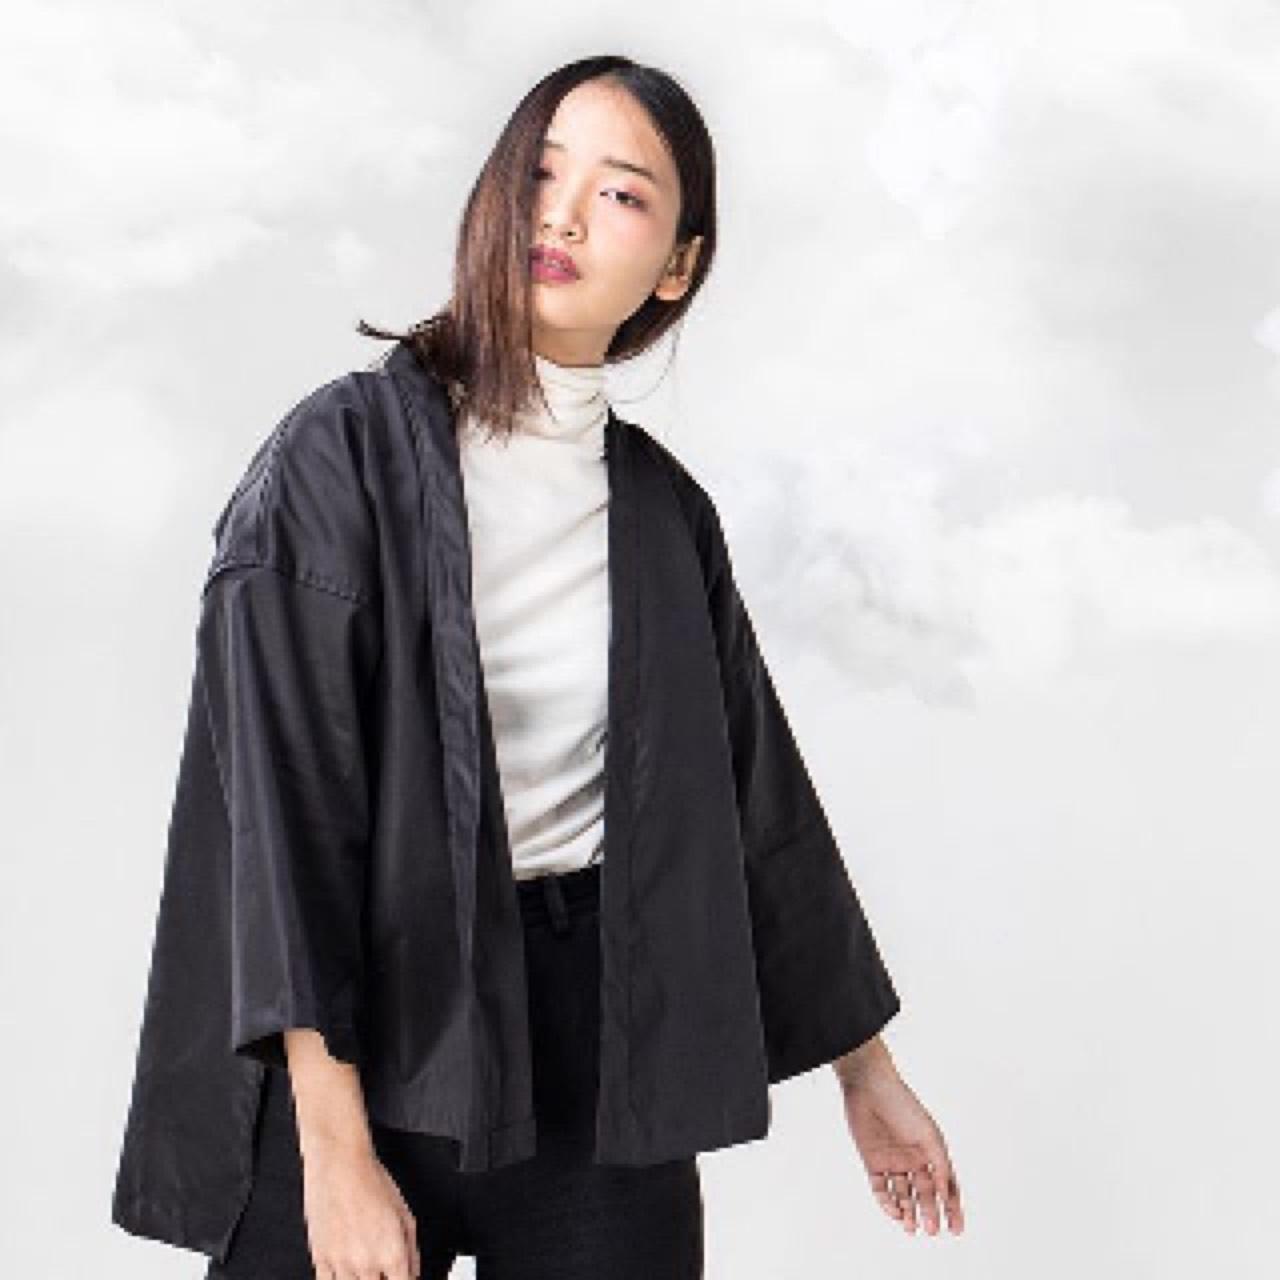 rnrclothingline,rusdyrasa,bkk,bangkok,thailand,kimono,streetstyle,fashion,fashionphotography,black,new,trend,style,Rnrclothingline